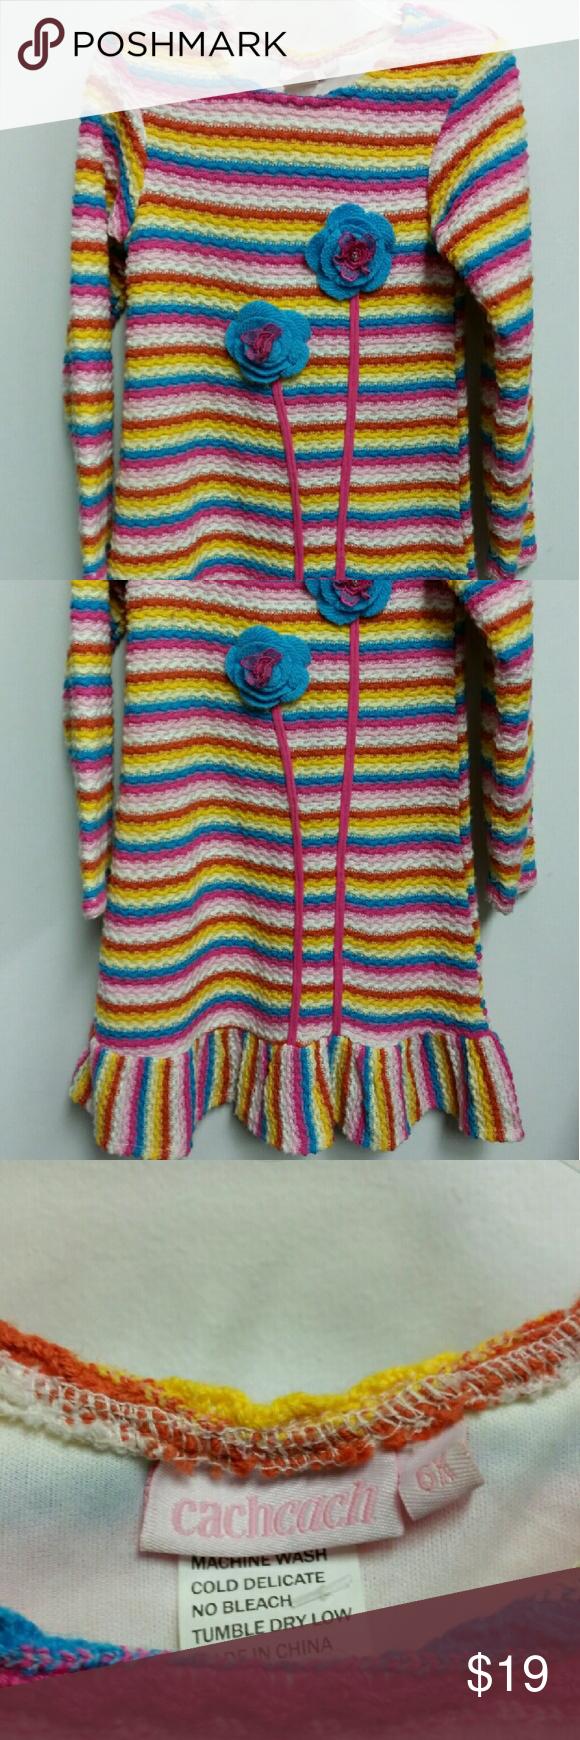 Cach cach designer girls flower sweater dress sz 6 Super cute! 3d flowers cach cach Dresses Casual